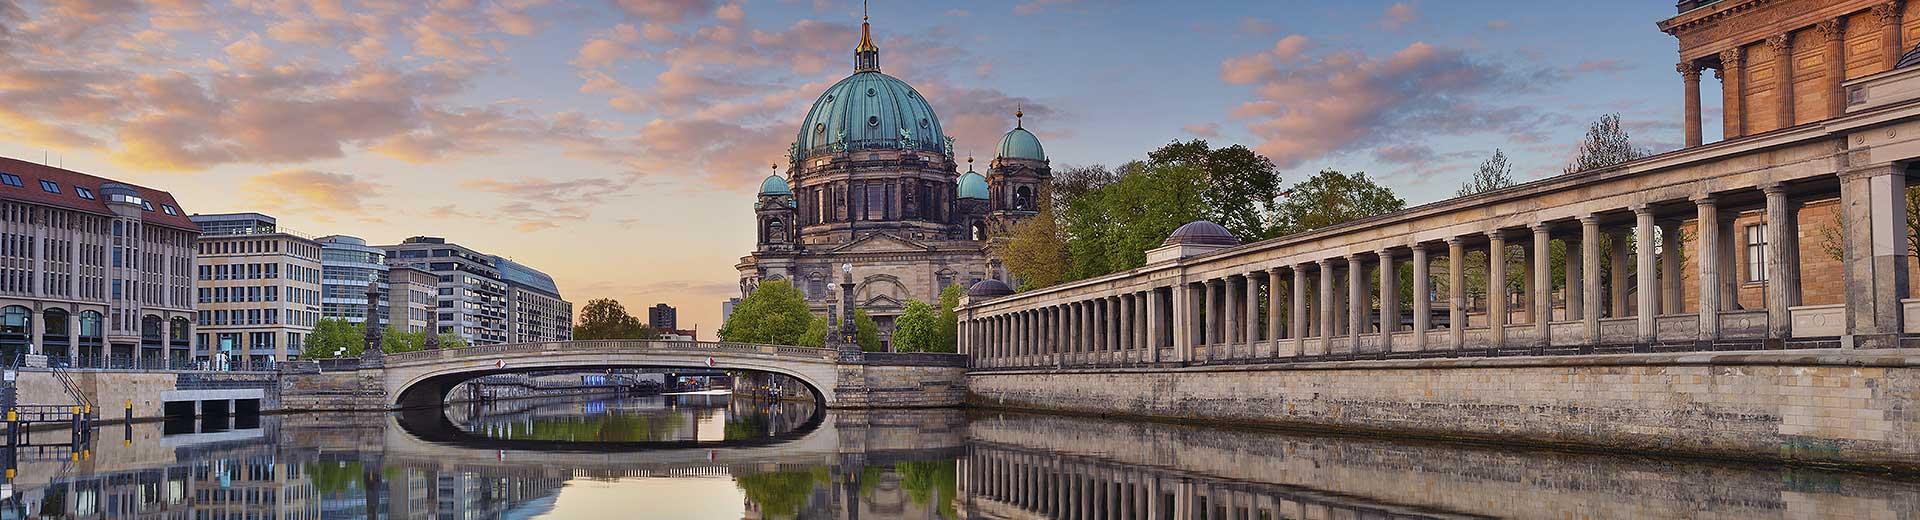 Gruppenreise Berlin - Package Gruppen Select Flug